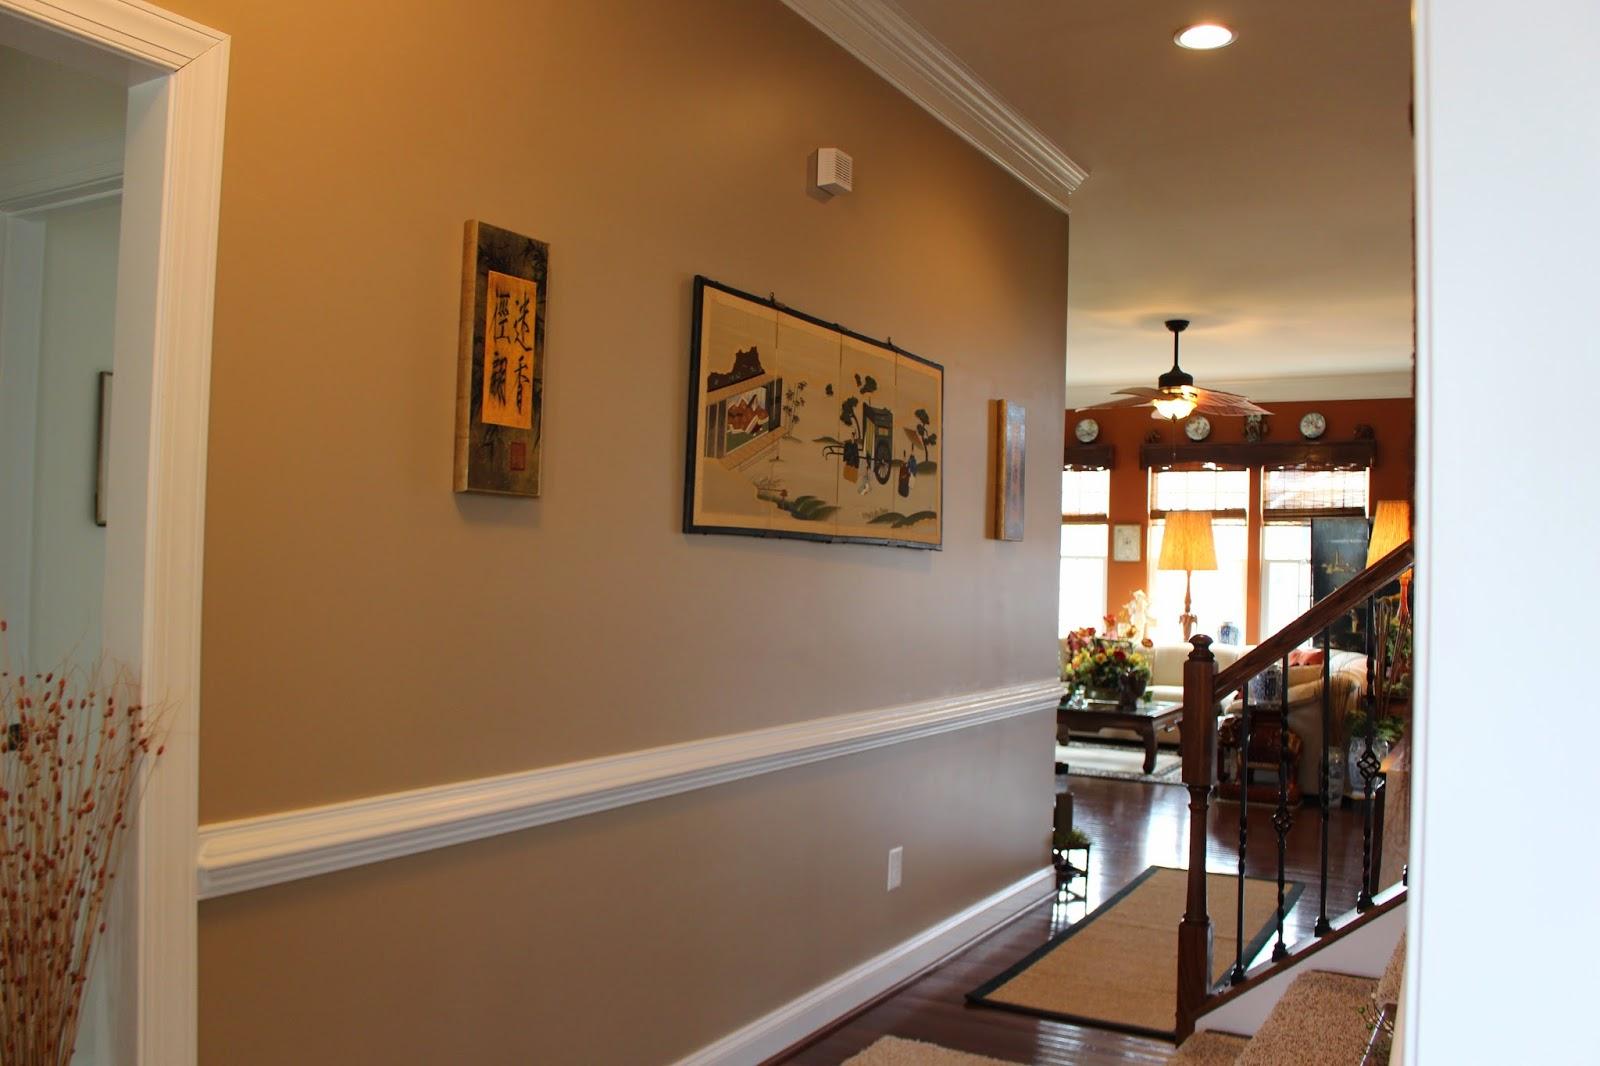 Valspar Living Room Paint Ideas Zion Star